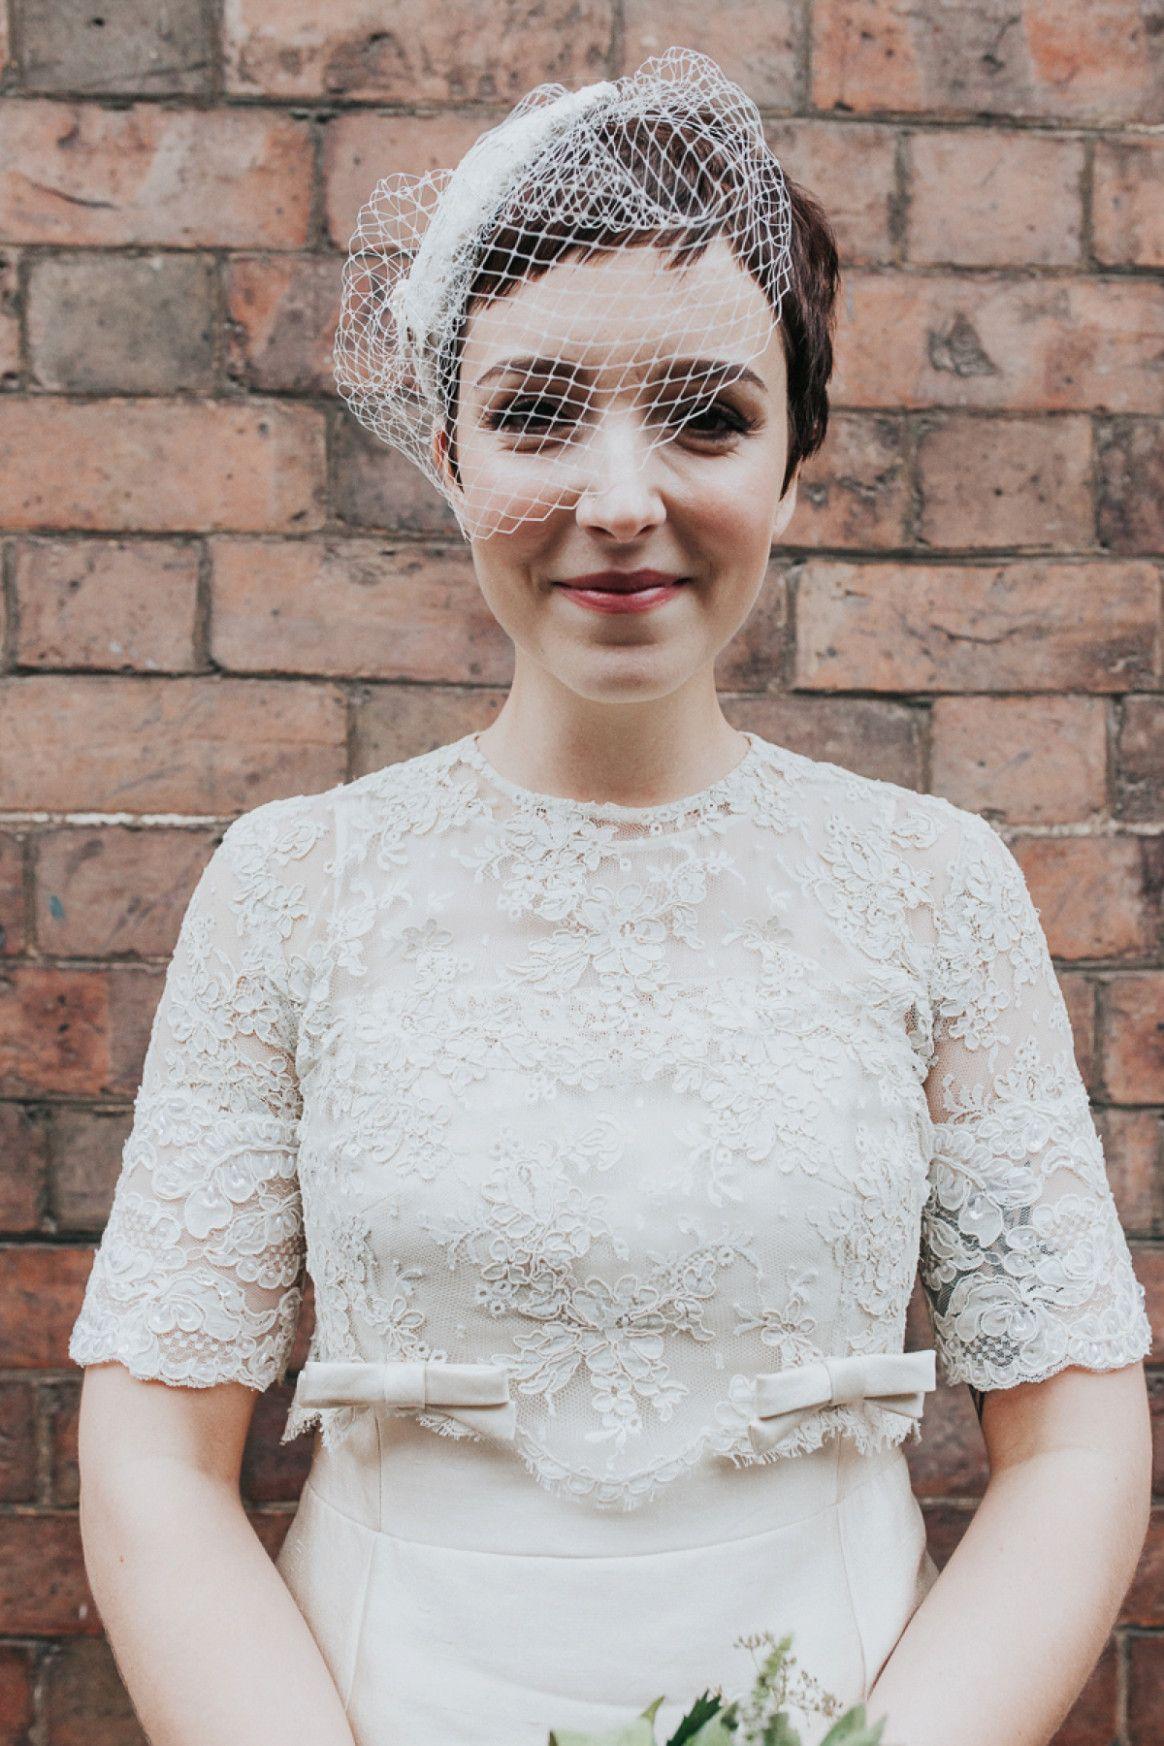 1960 wedding dresses  A Short Chic Vintage Dress for a   Wedding Inspirations